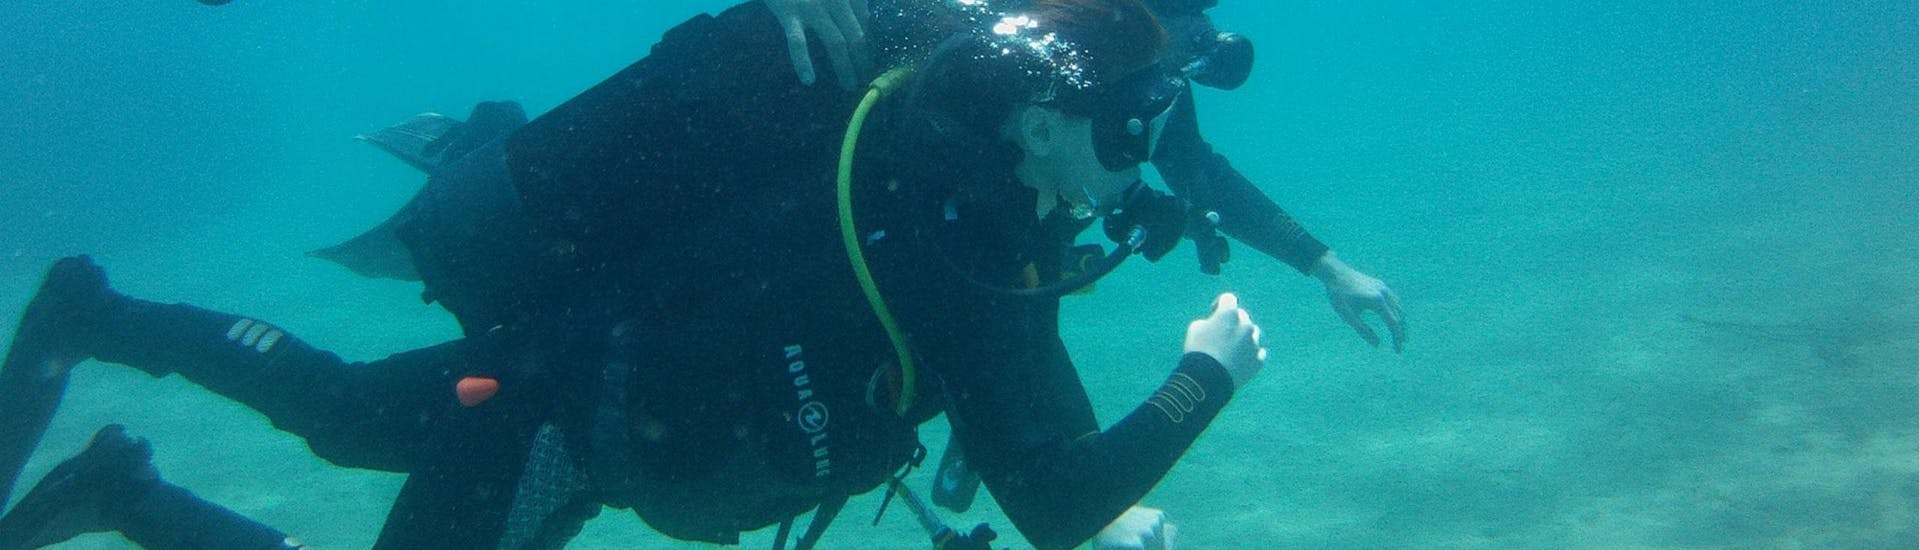 trial-scuba-diving-course-for-beginners---discover-scuba-crete-divers-club-crete-hero